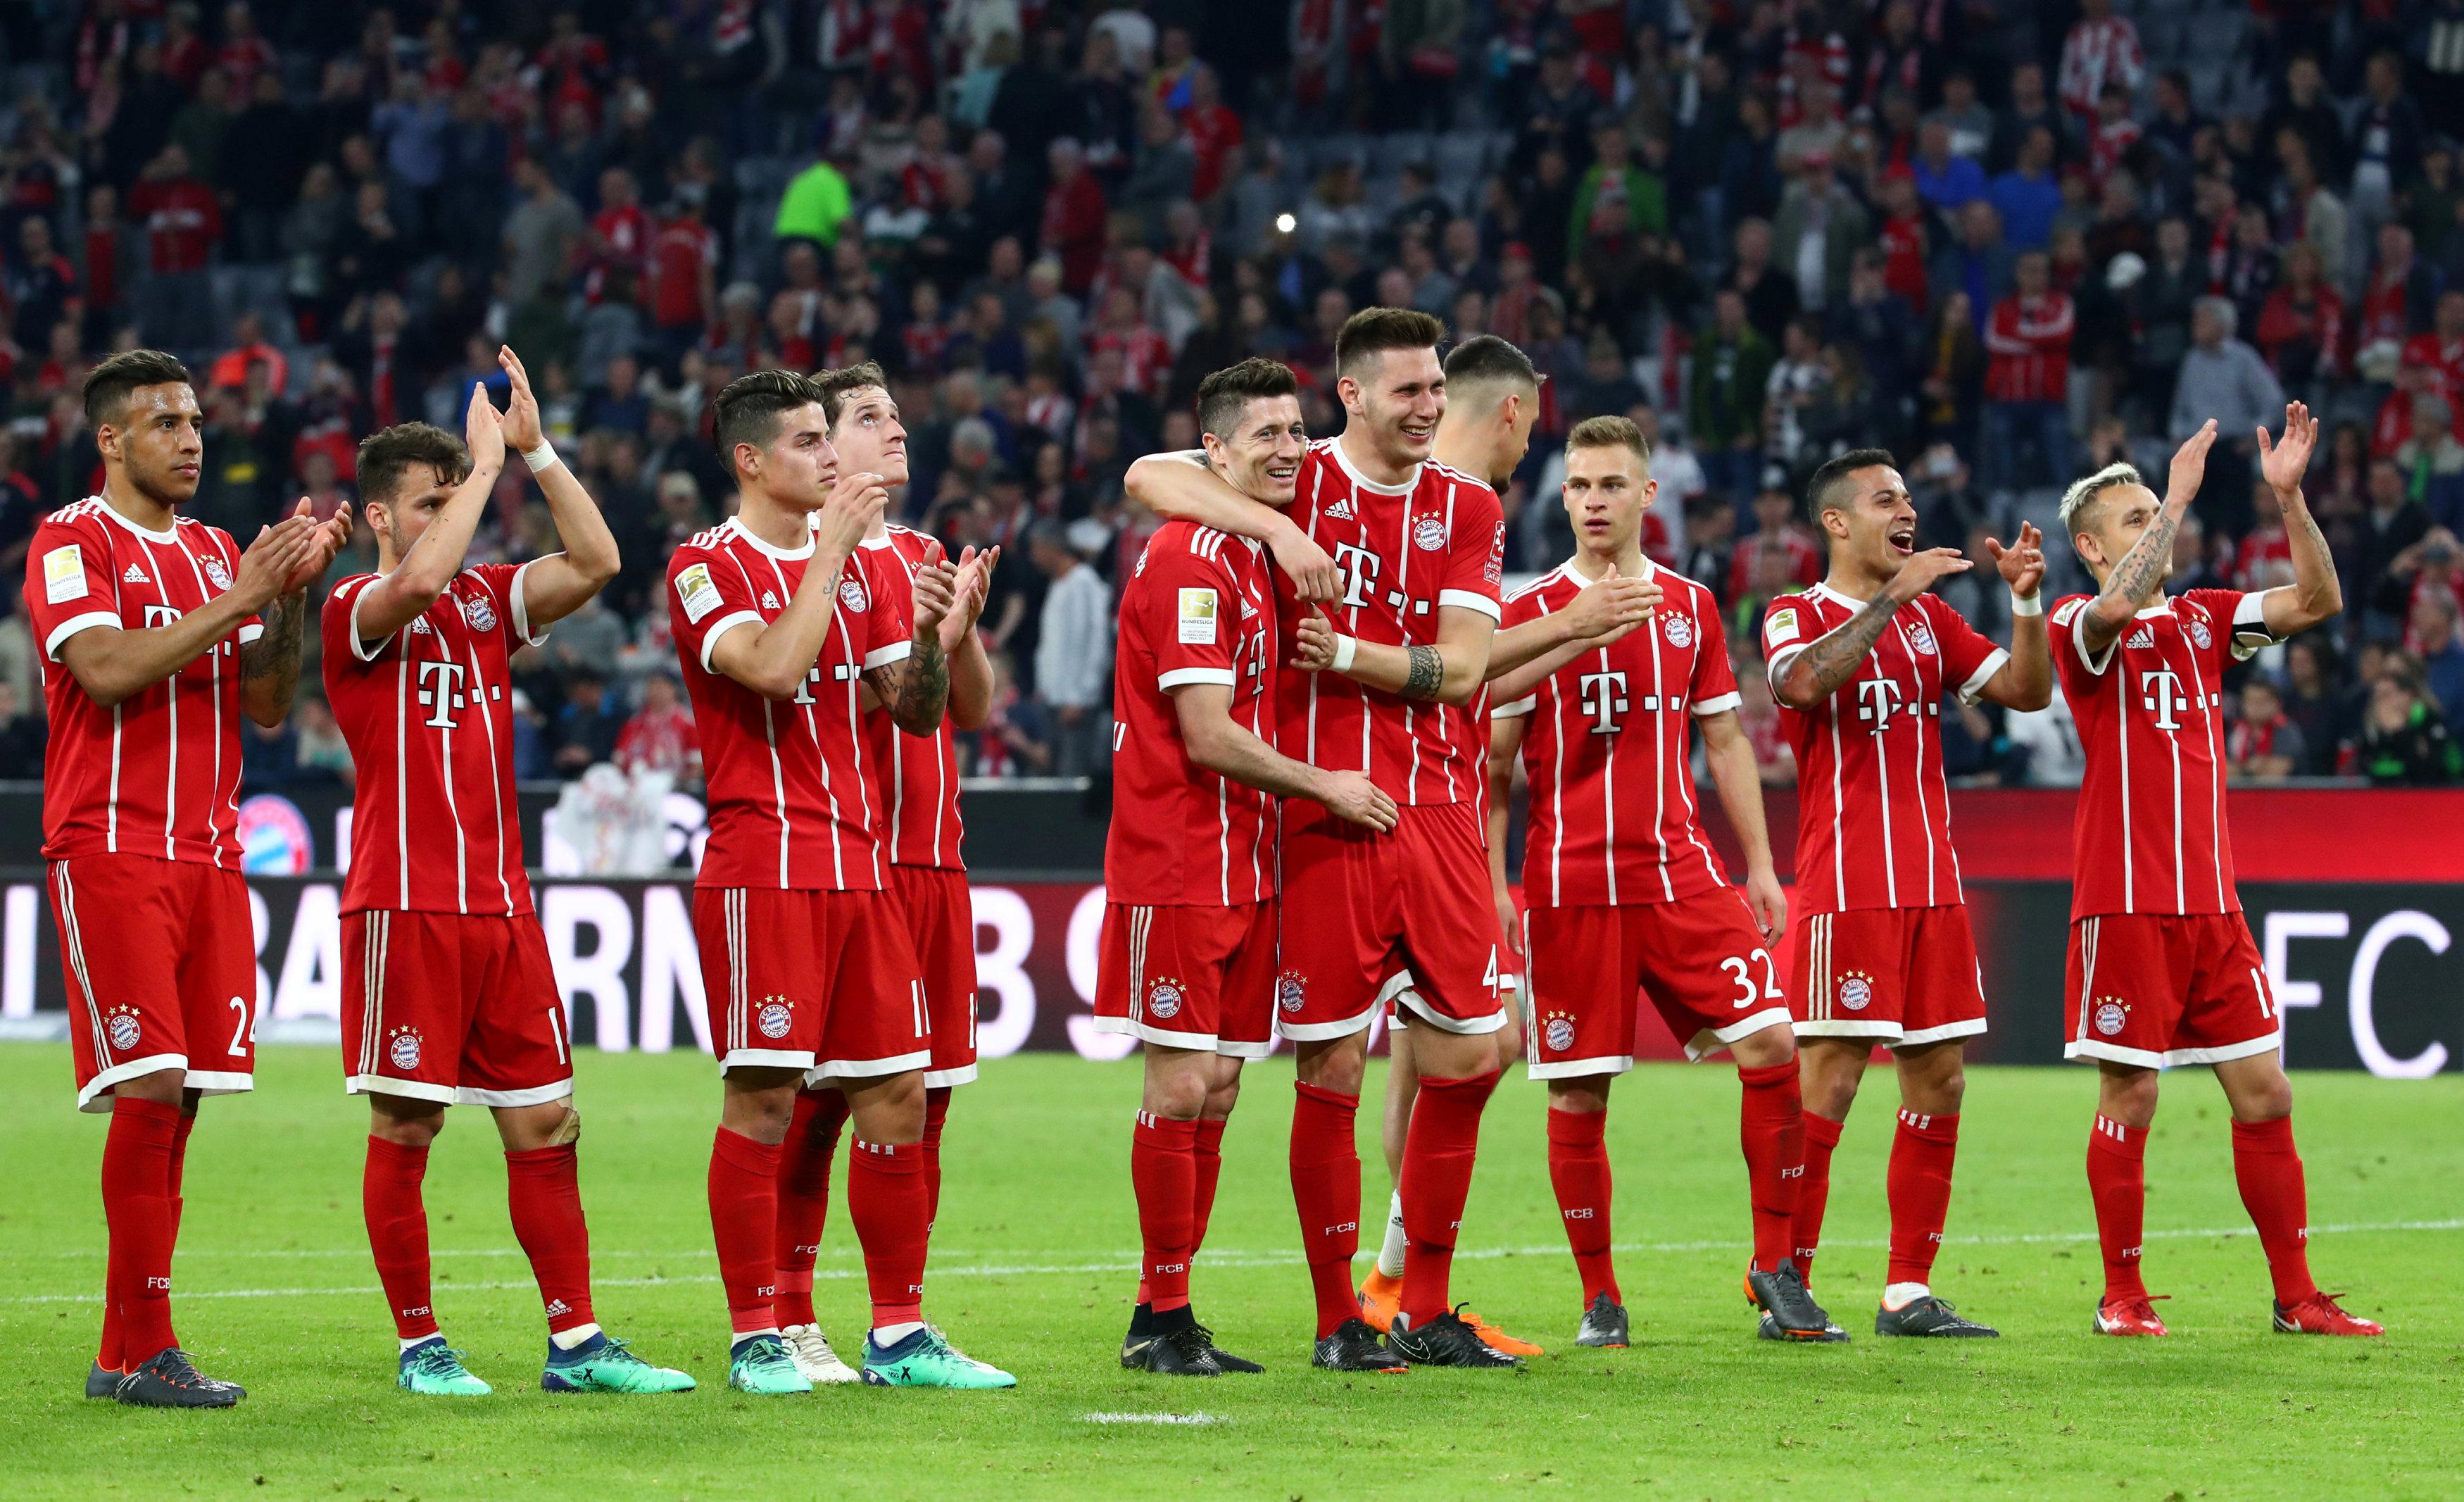 Football - Etranger - Déjà champion, le Bayern s'amuse, Leverkusen se place